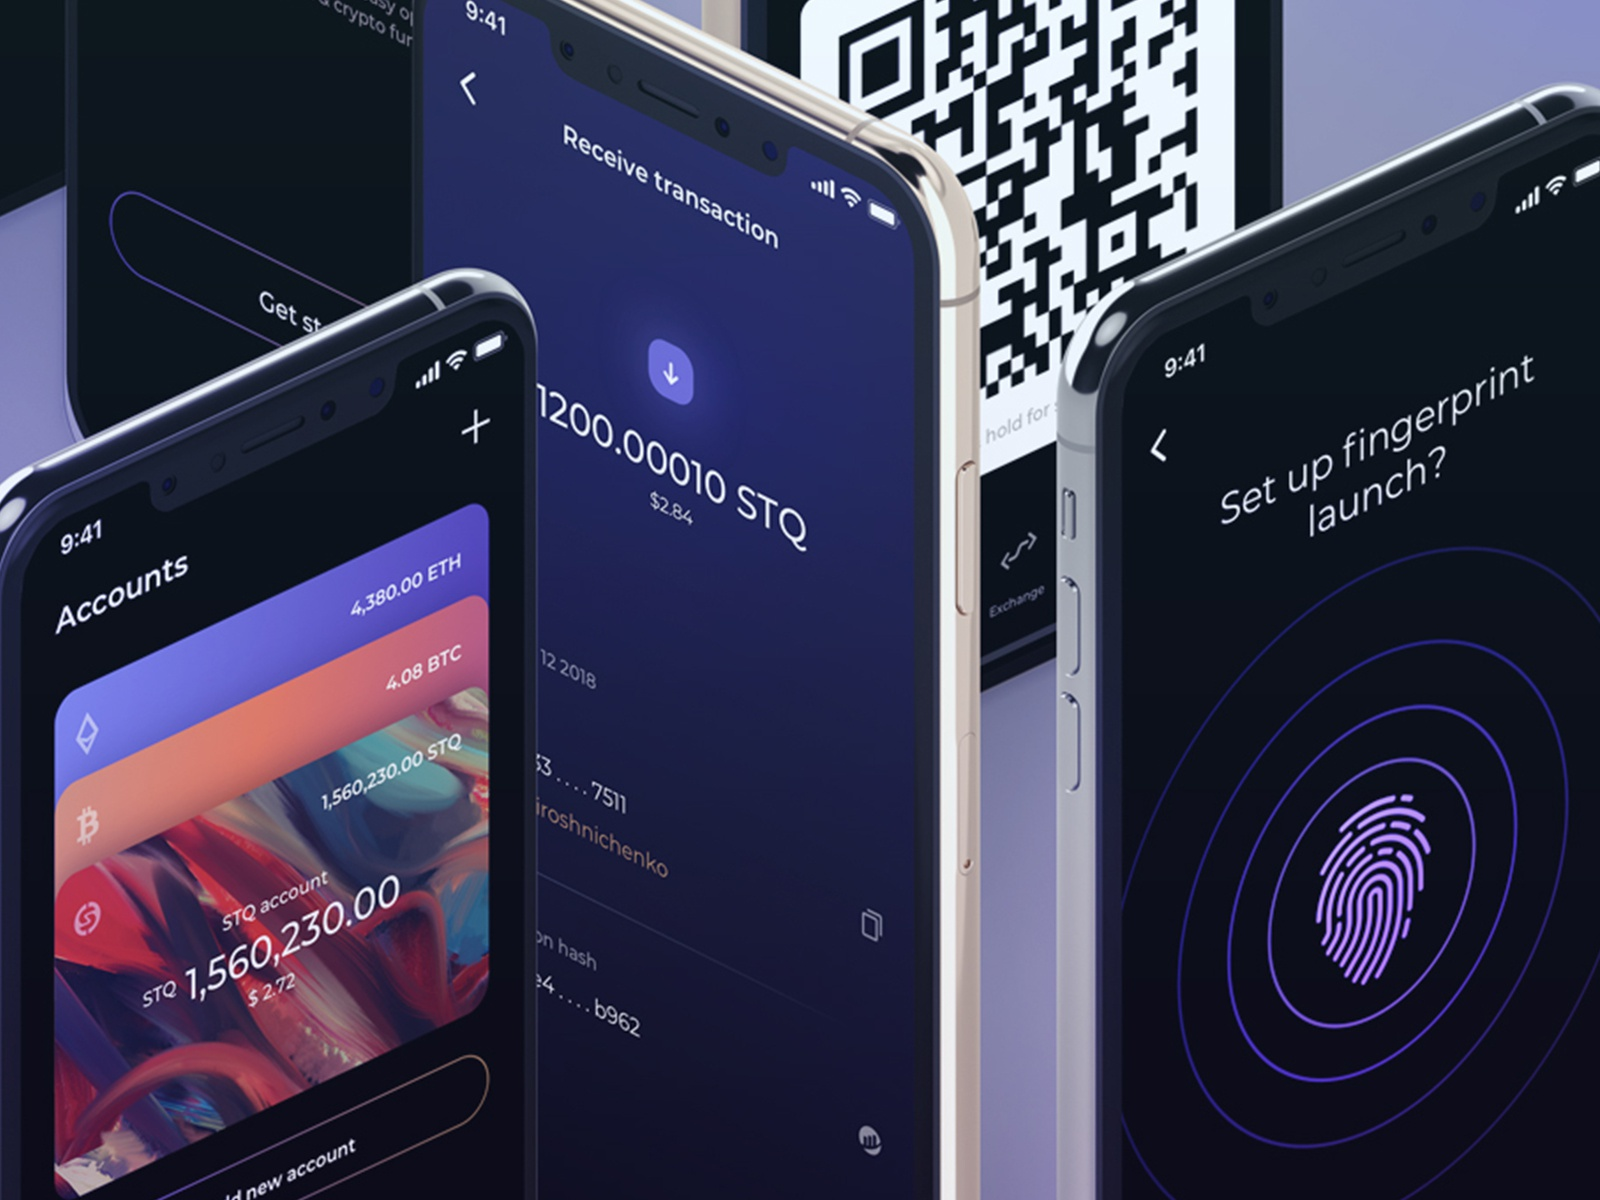 Wallet app 2